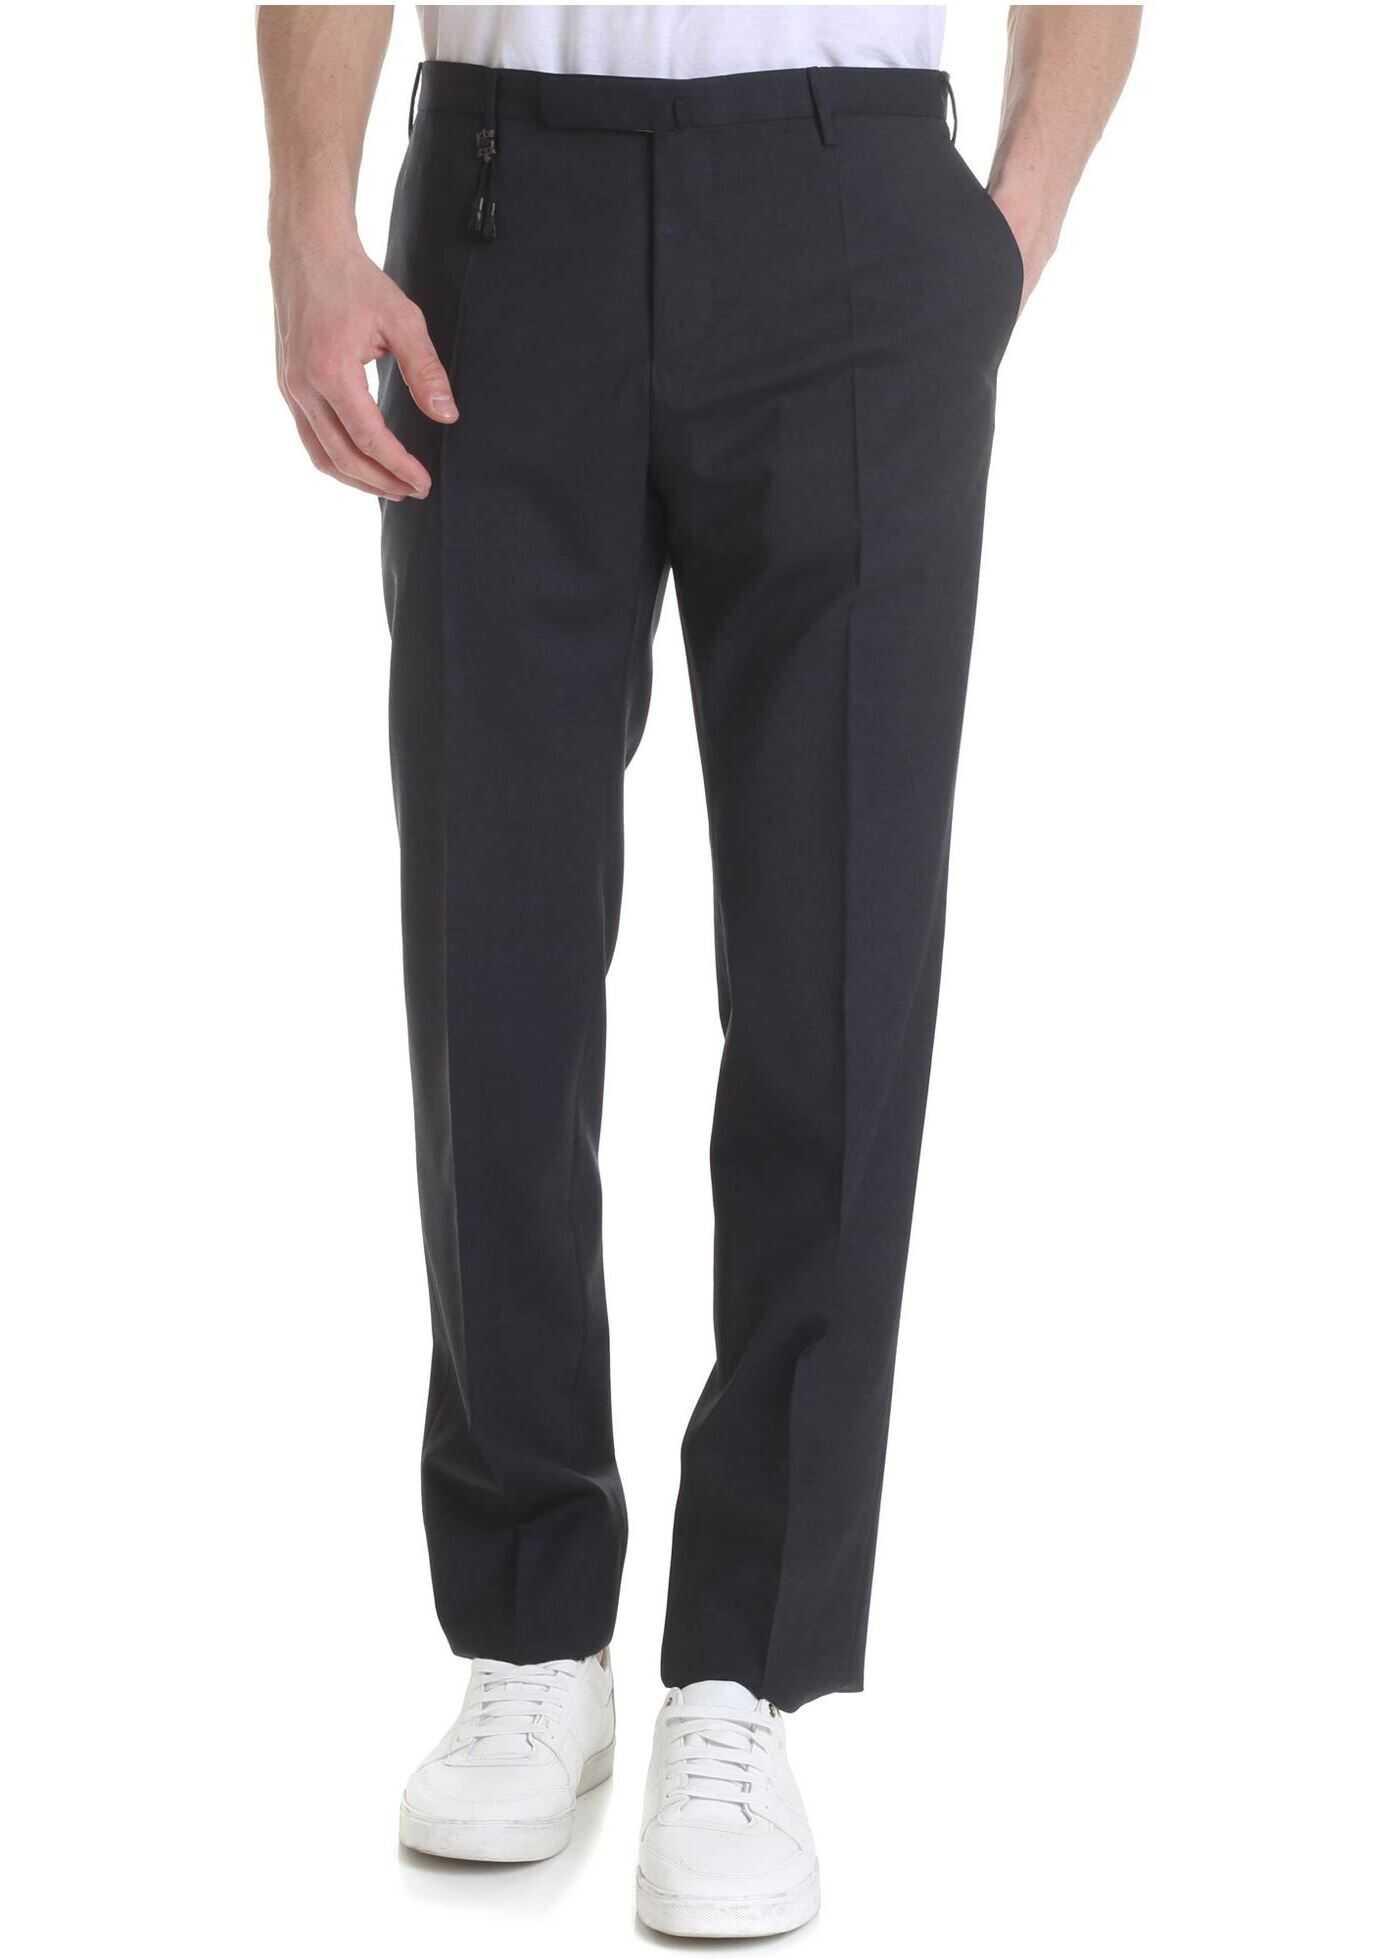 Incotex Dark Grey Virgin Wool Trousers Grey imagine